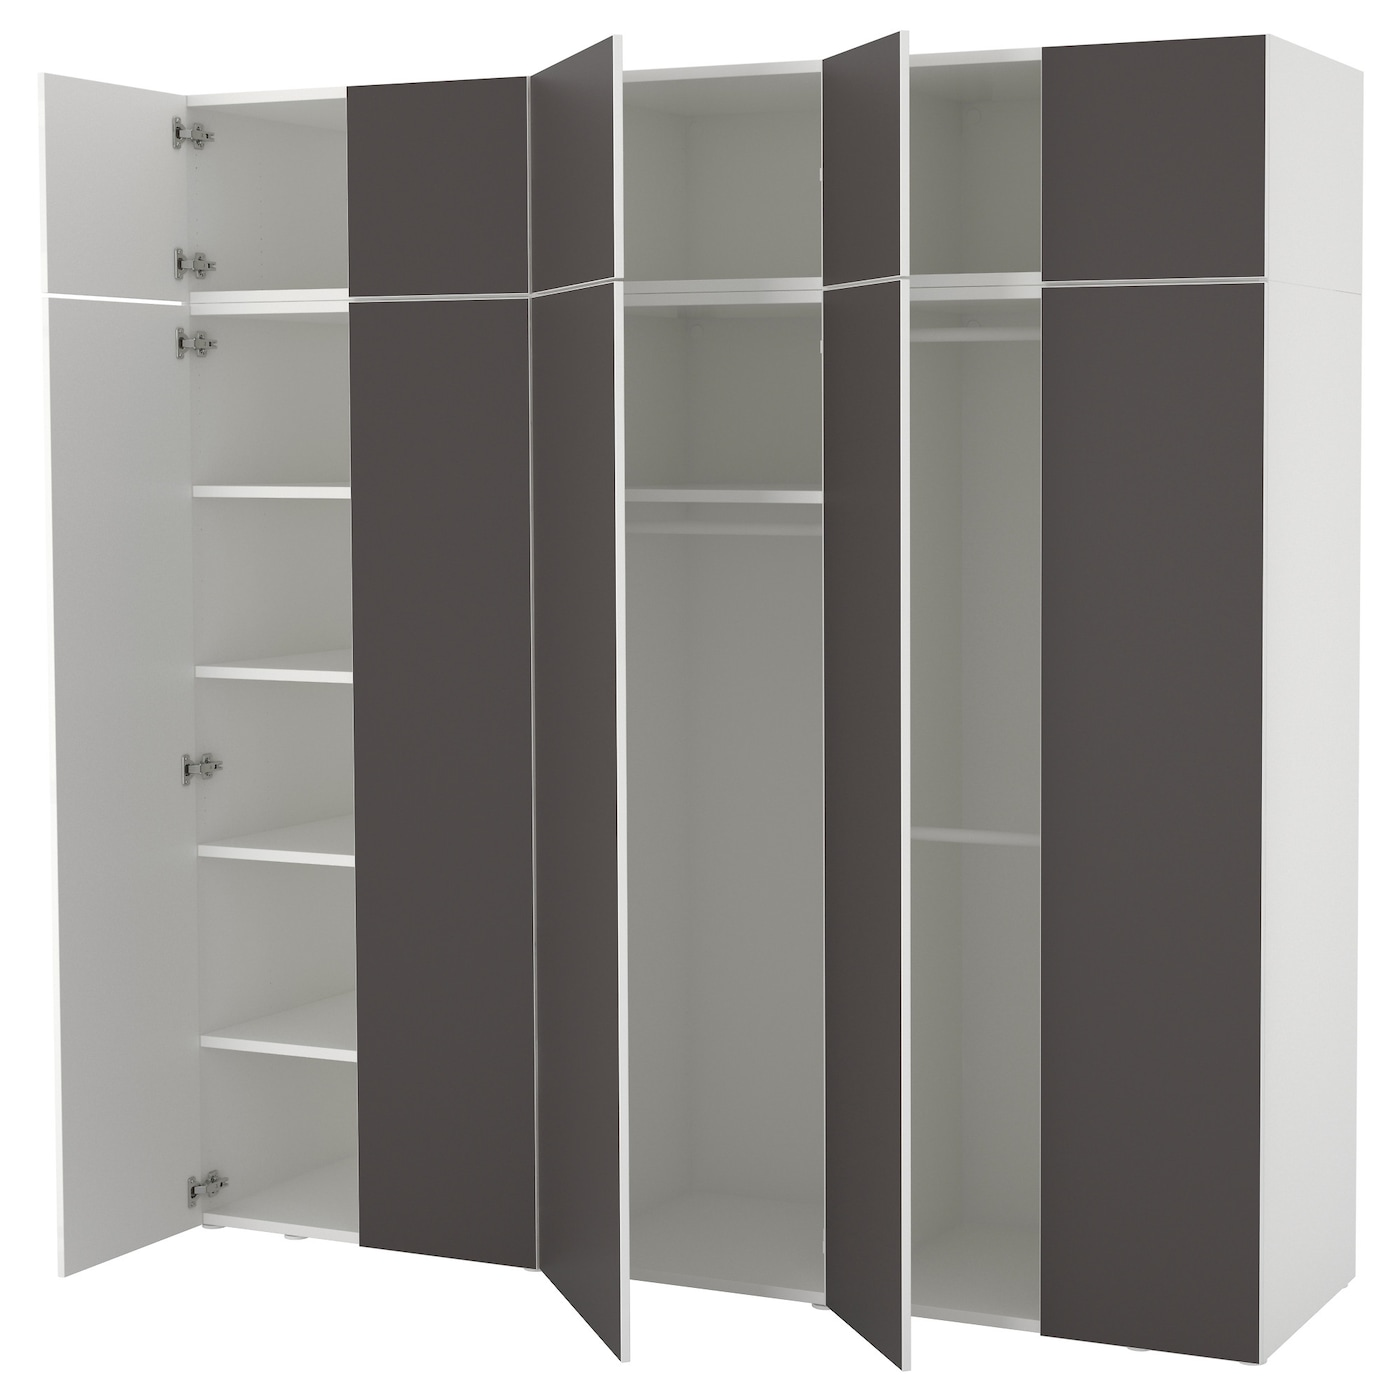 platsa kledingkast wit skatval donkergrijs 220 x 57 x 221 cm ikea. Black Bedroom Furniture Sets. Home Design Ideas